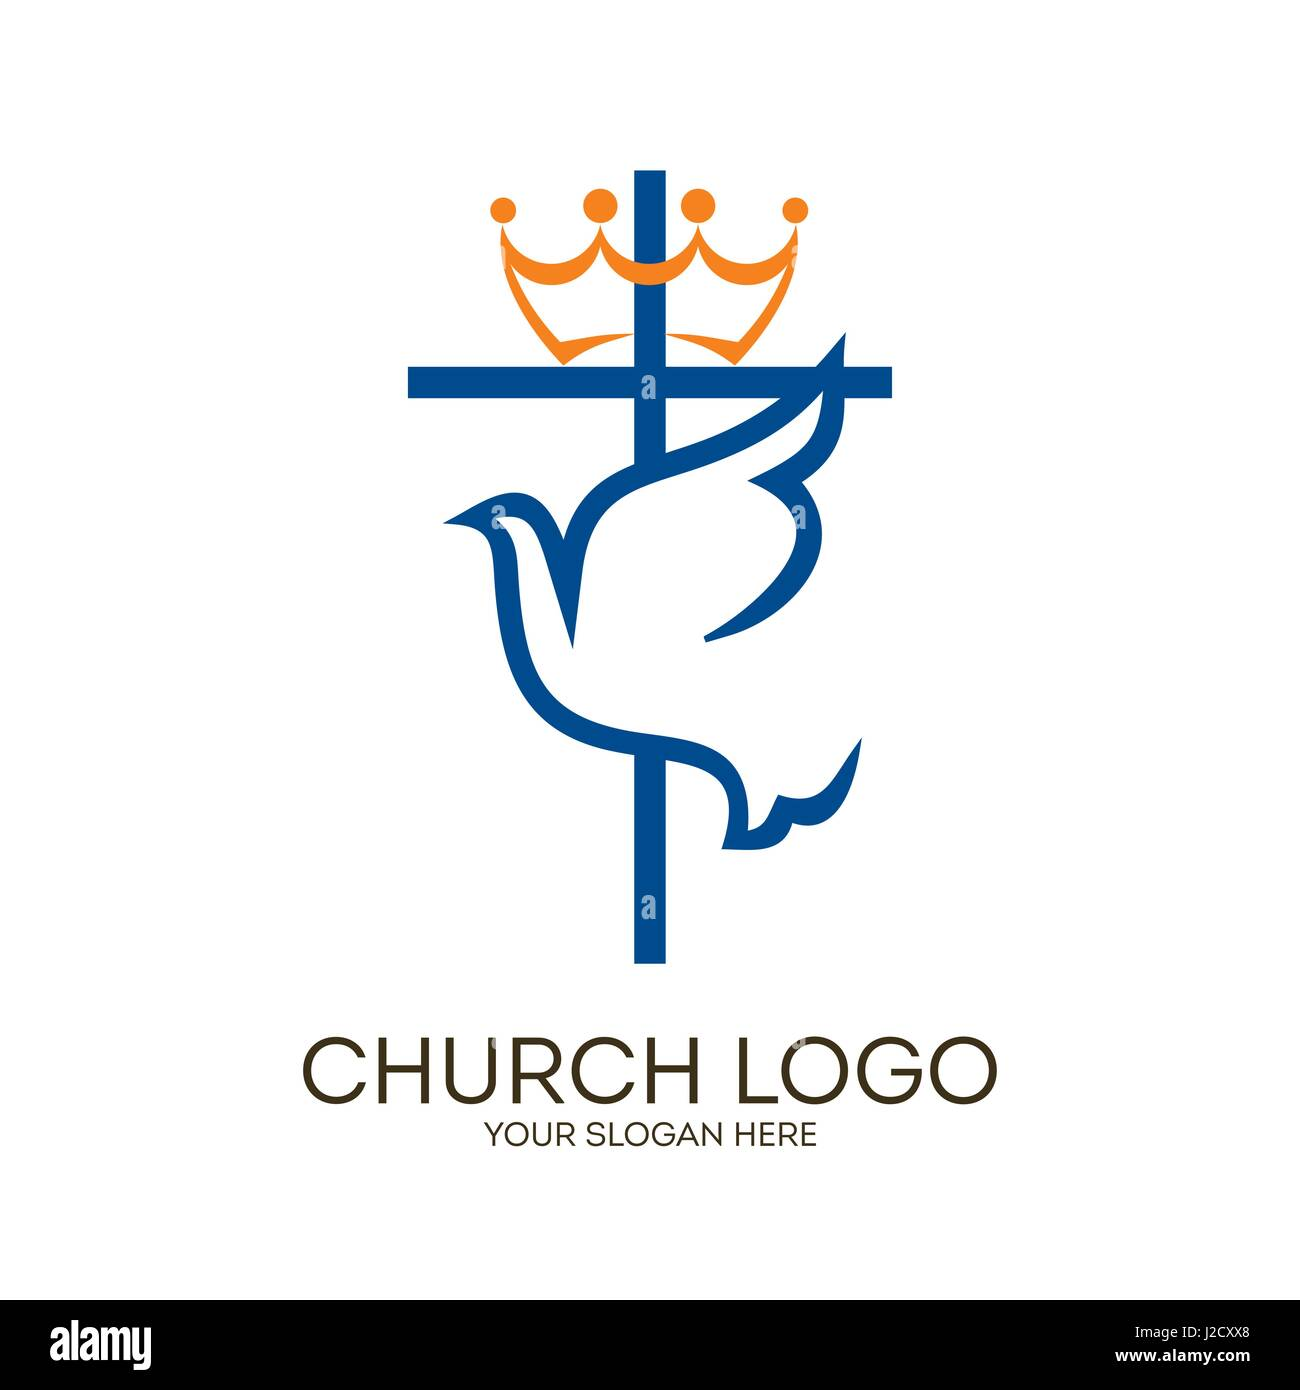 Church logo christian symbols cross and dove holy spirit stock church logo christian symbols cross and dove holy spirit thecheapjerseys Gallery